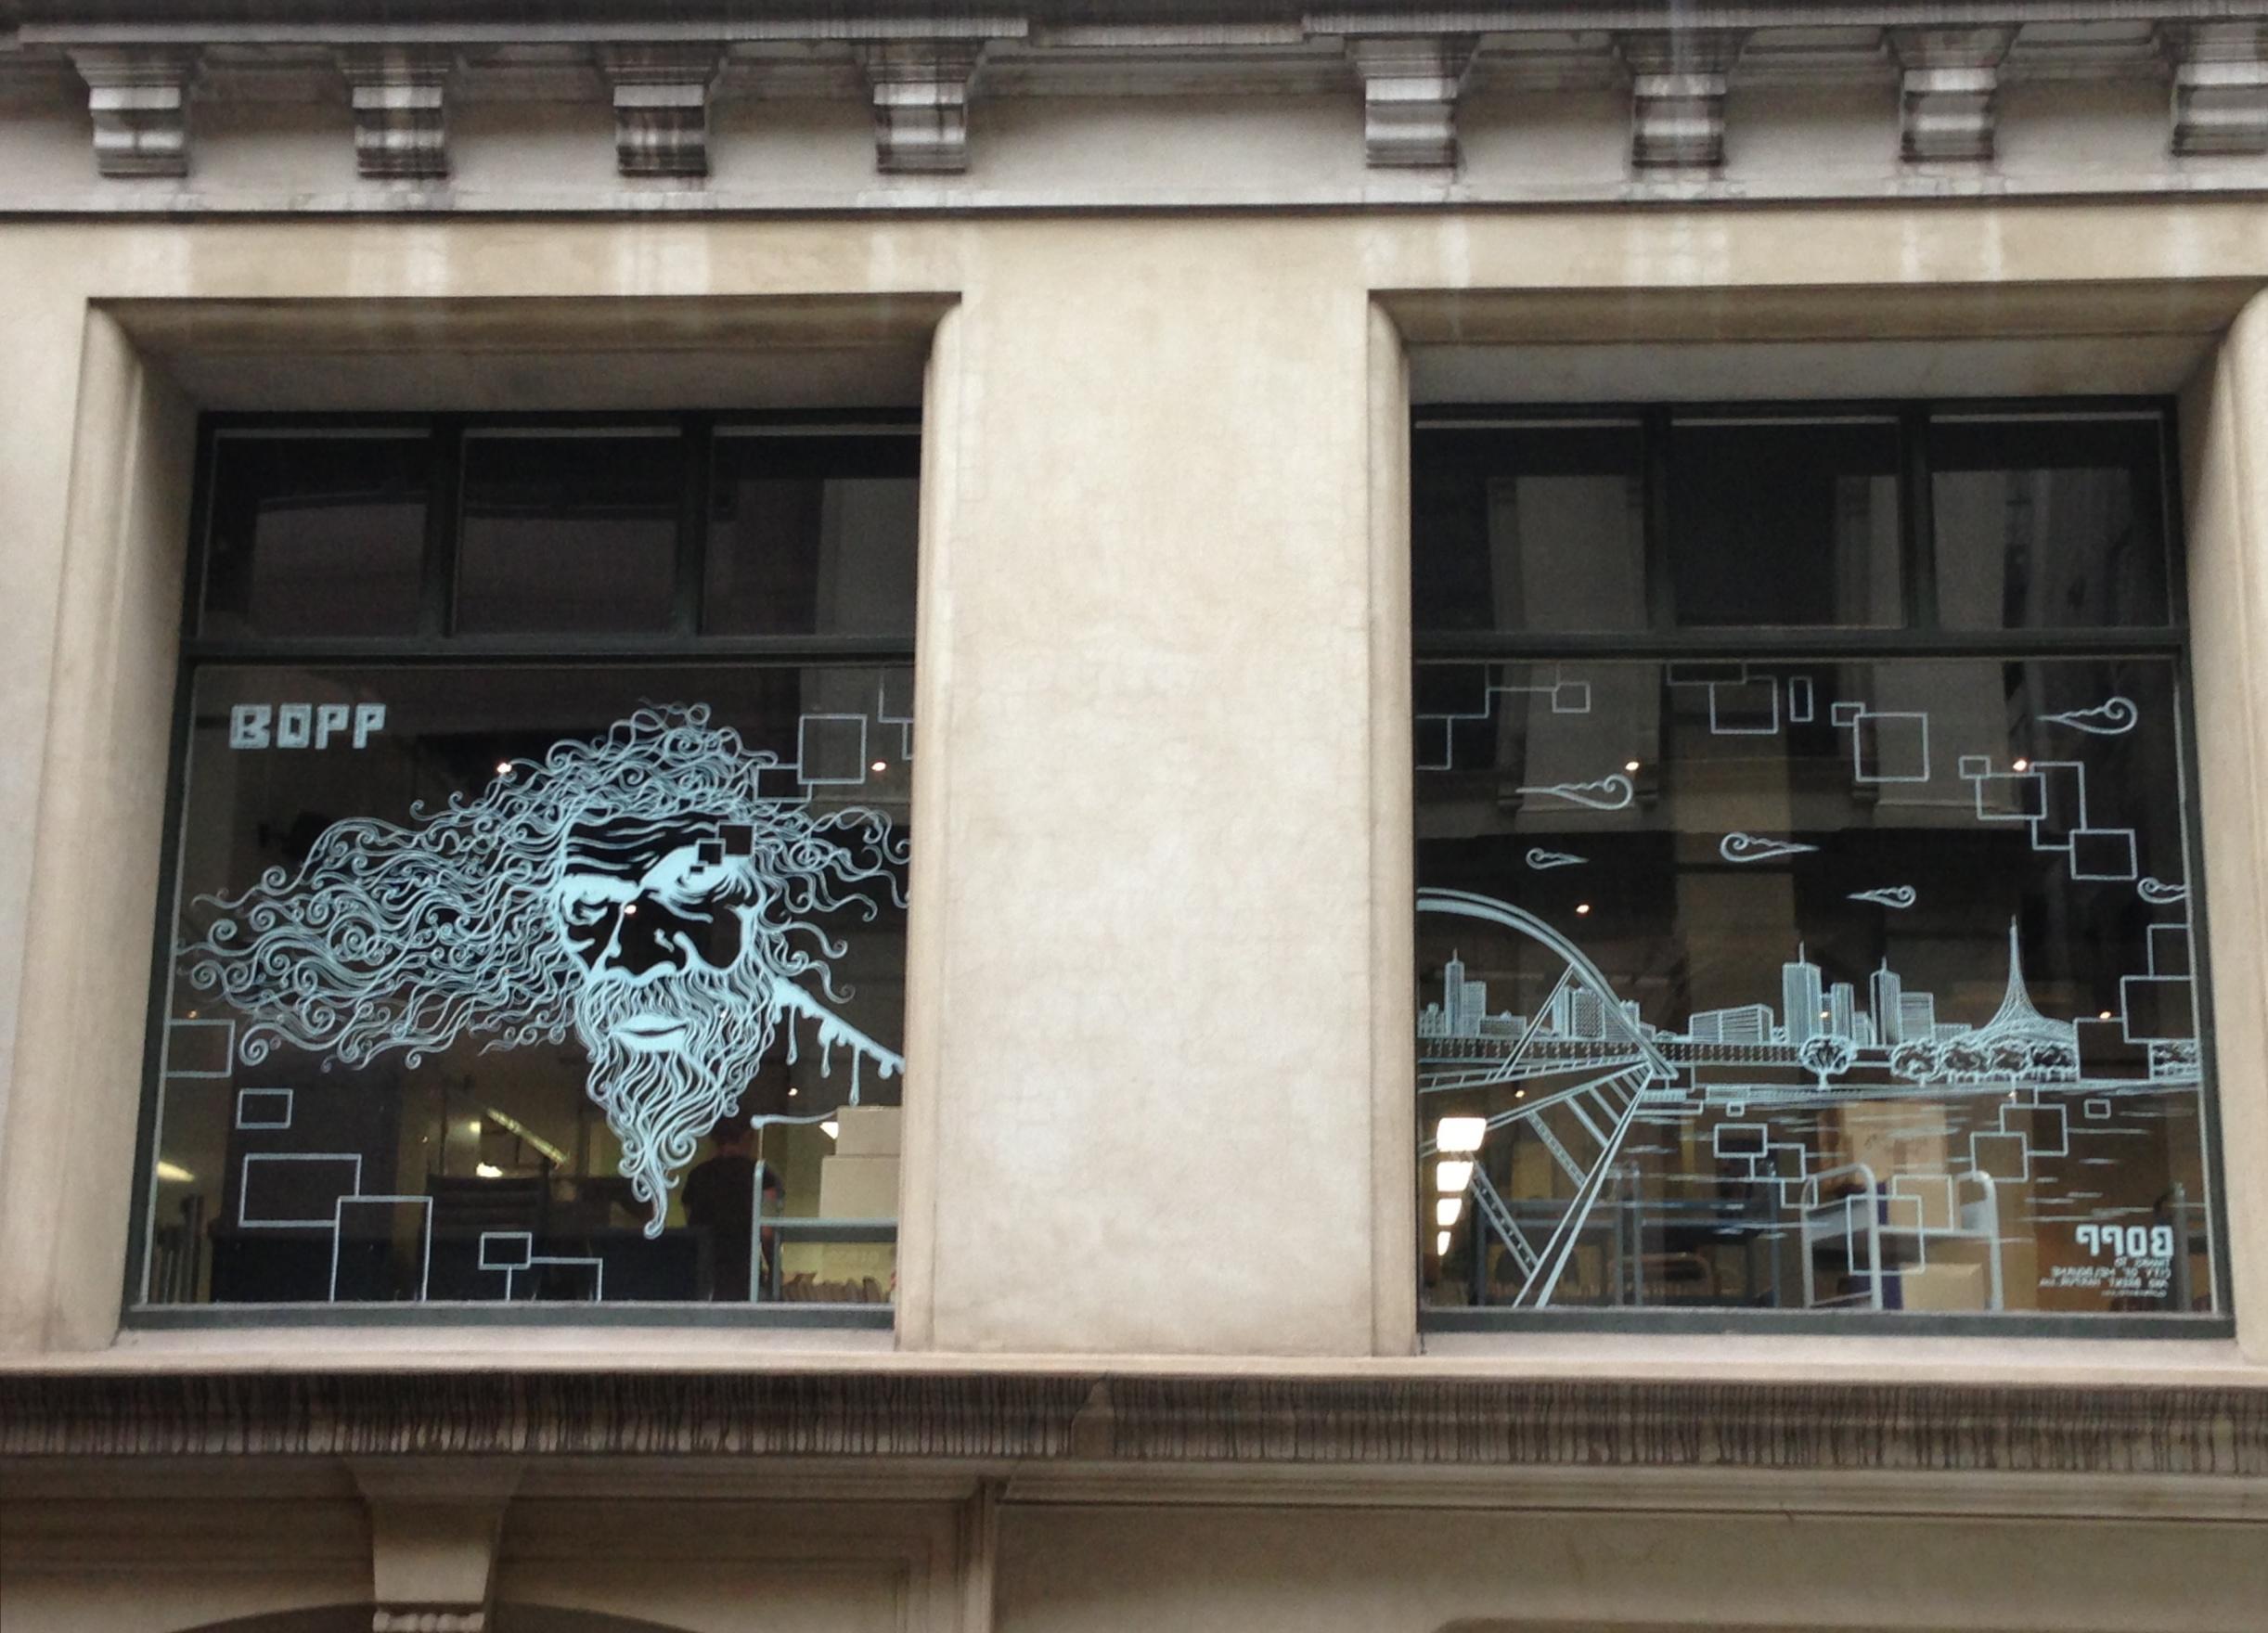 'View points' acrylic on glass 9'x20' Melbourne, Australia